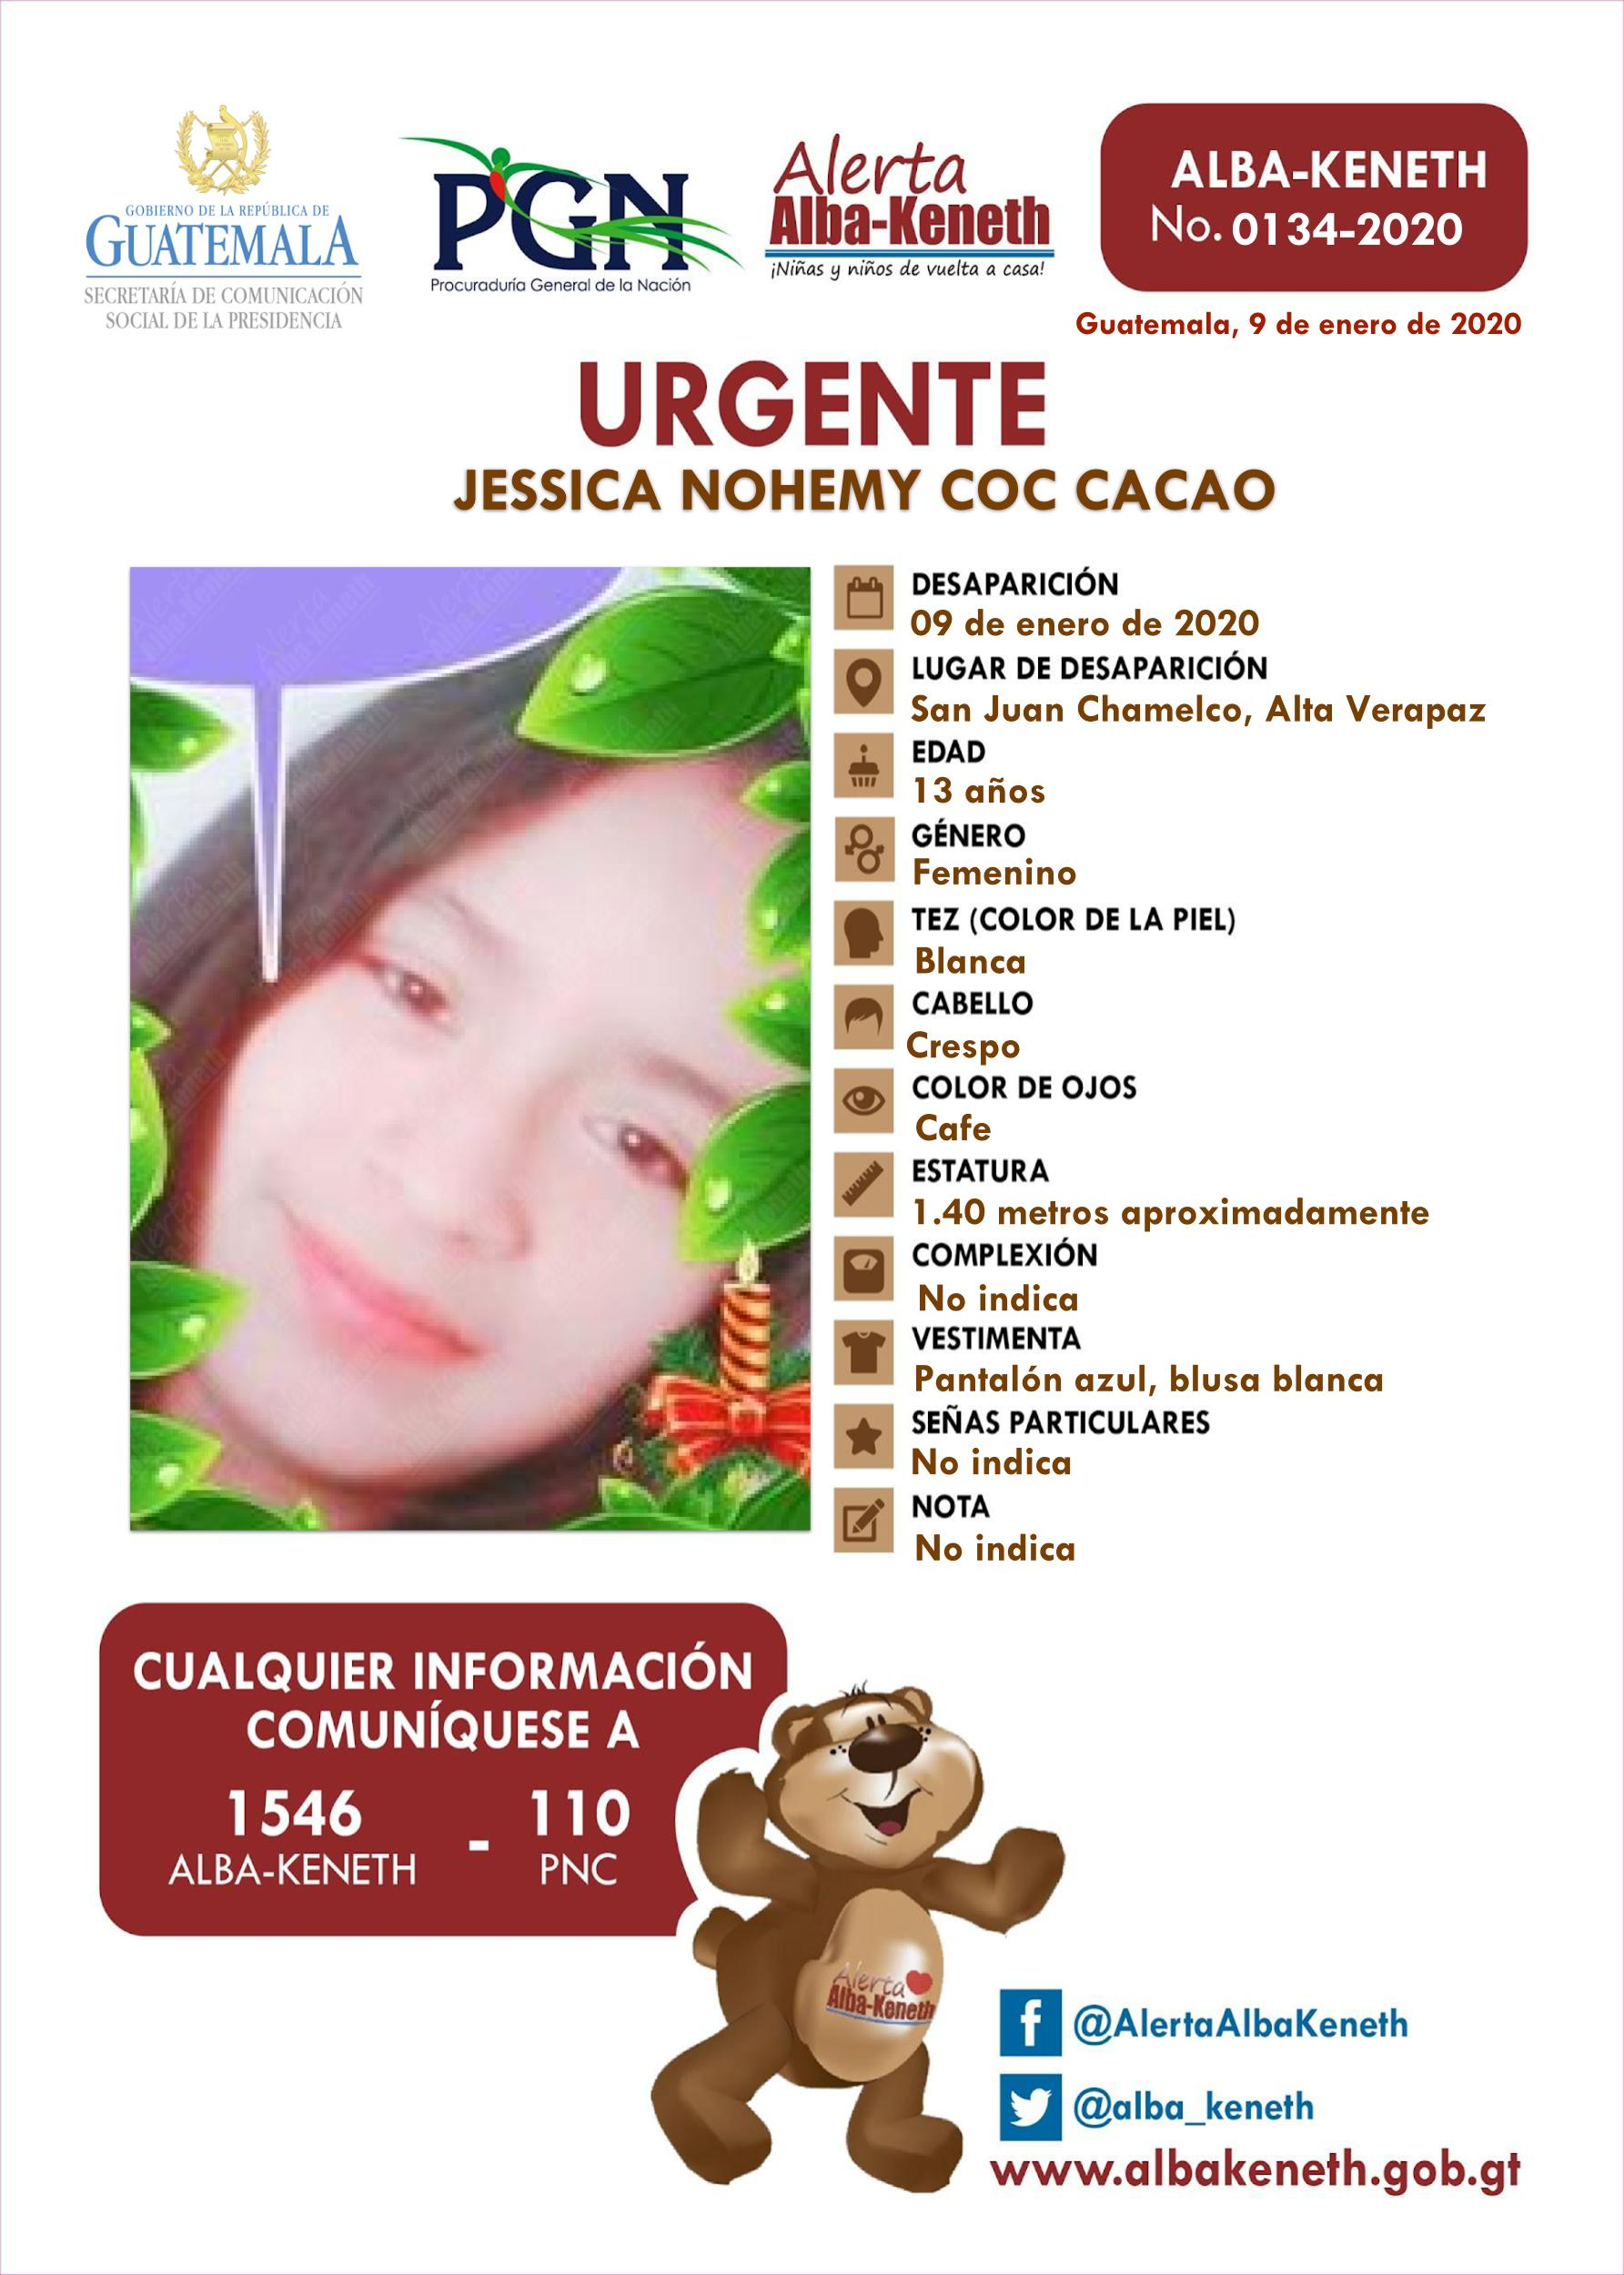 Jessica Nohemi Coc Cacao